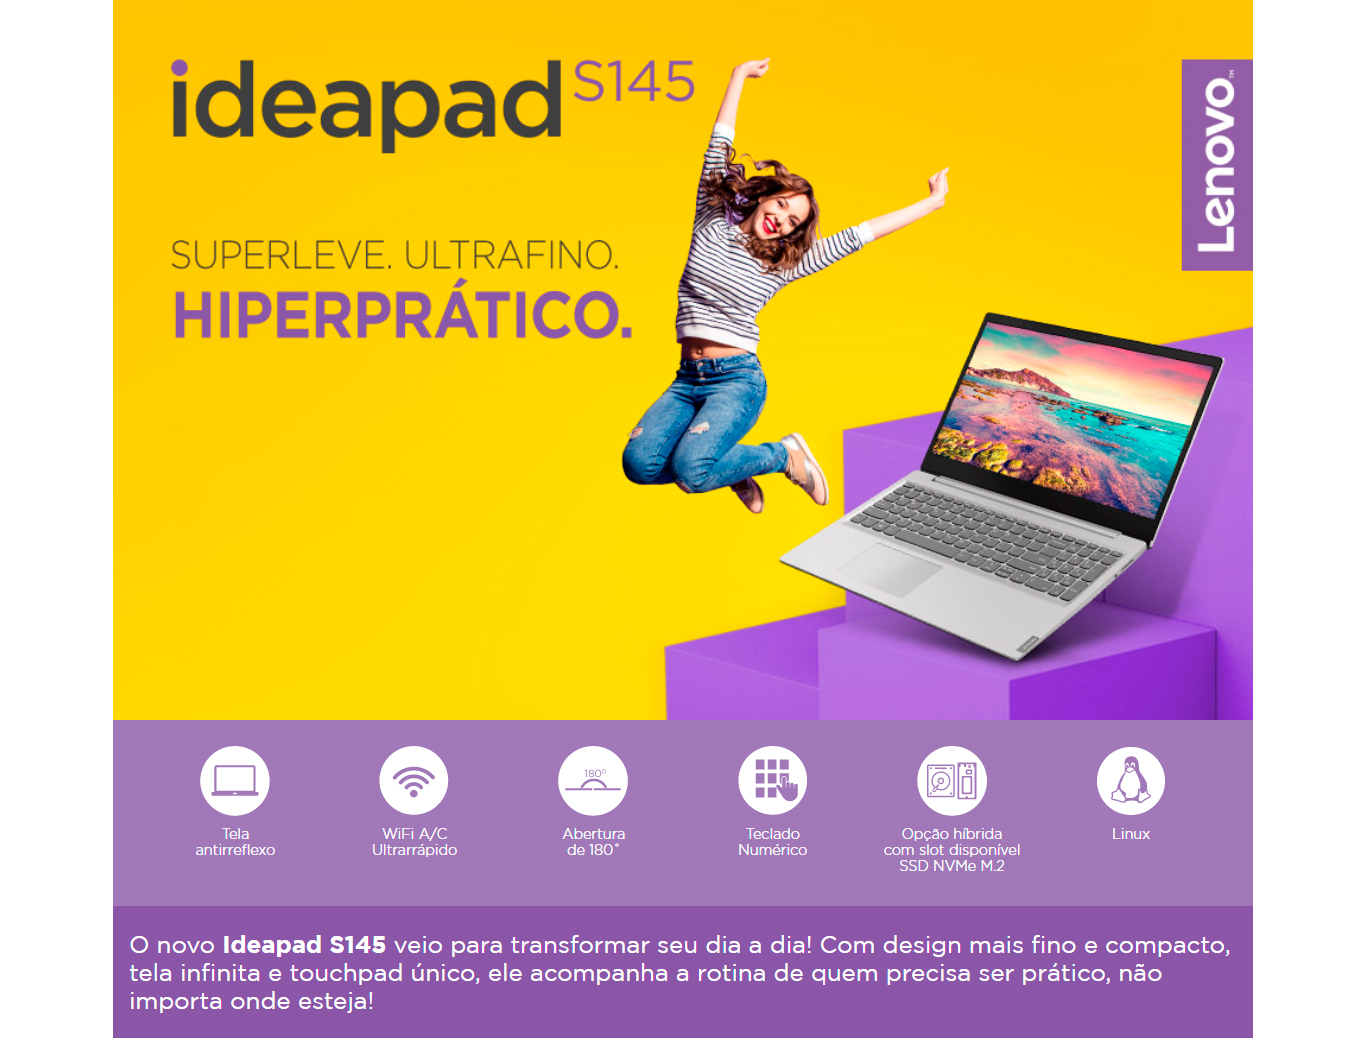 Notebook Lenovo Ideapad S145 Ryzen 5-3500U 12GB 1TB RX Vega 8 15,6 HD  Linux, Prata - 81V7S00000